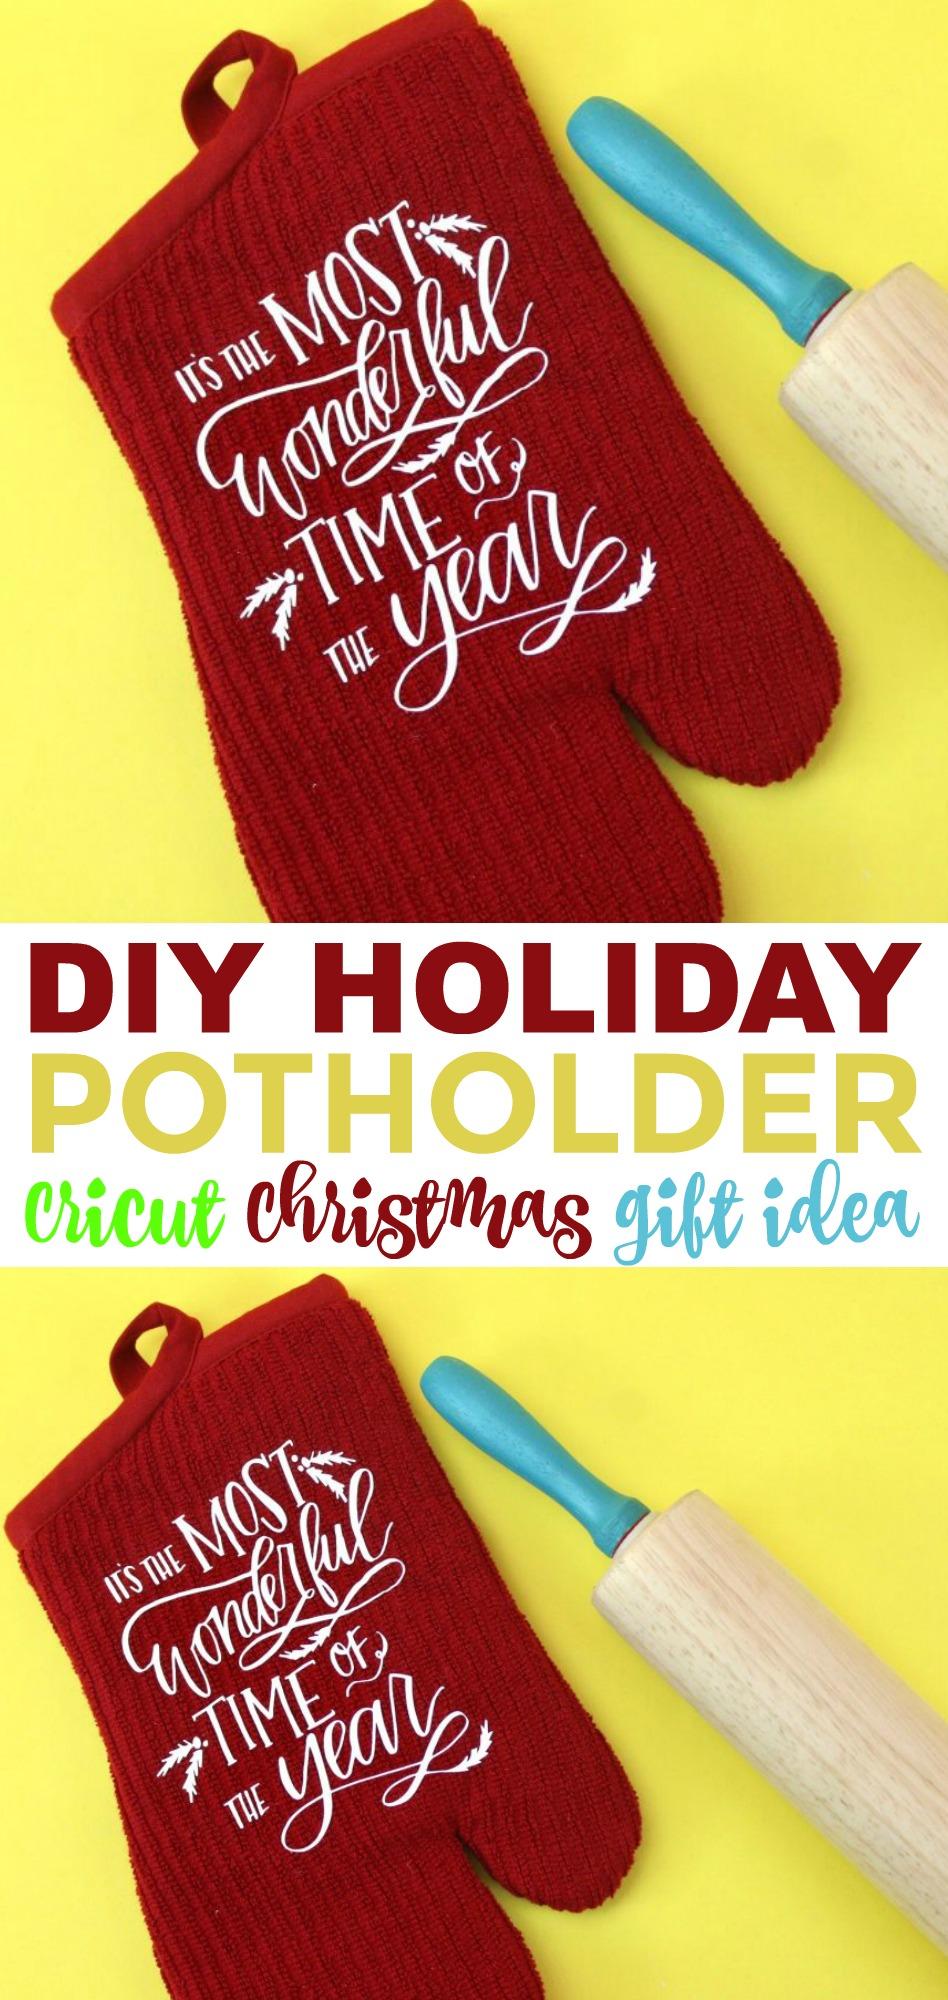 Little Christmas Gift Ideas.Diy Holiday Potholder Cricut Christmas Gift Idea A